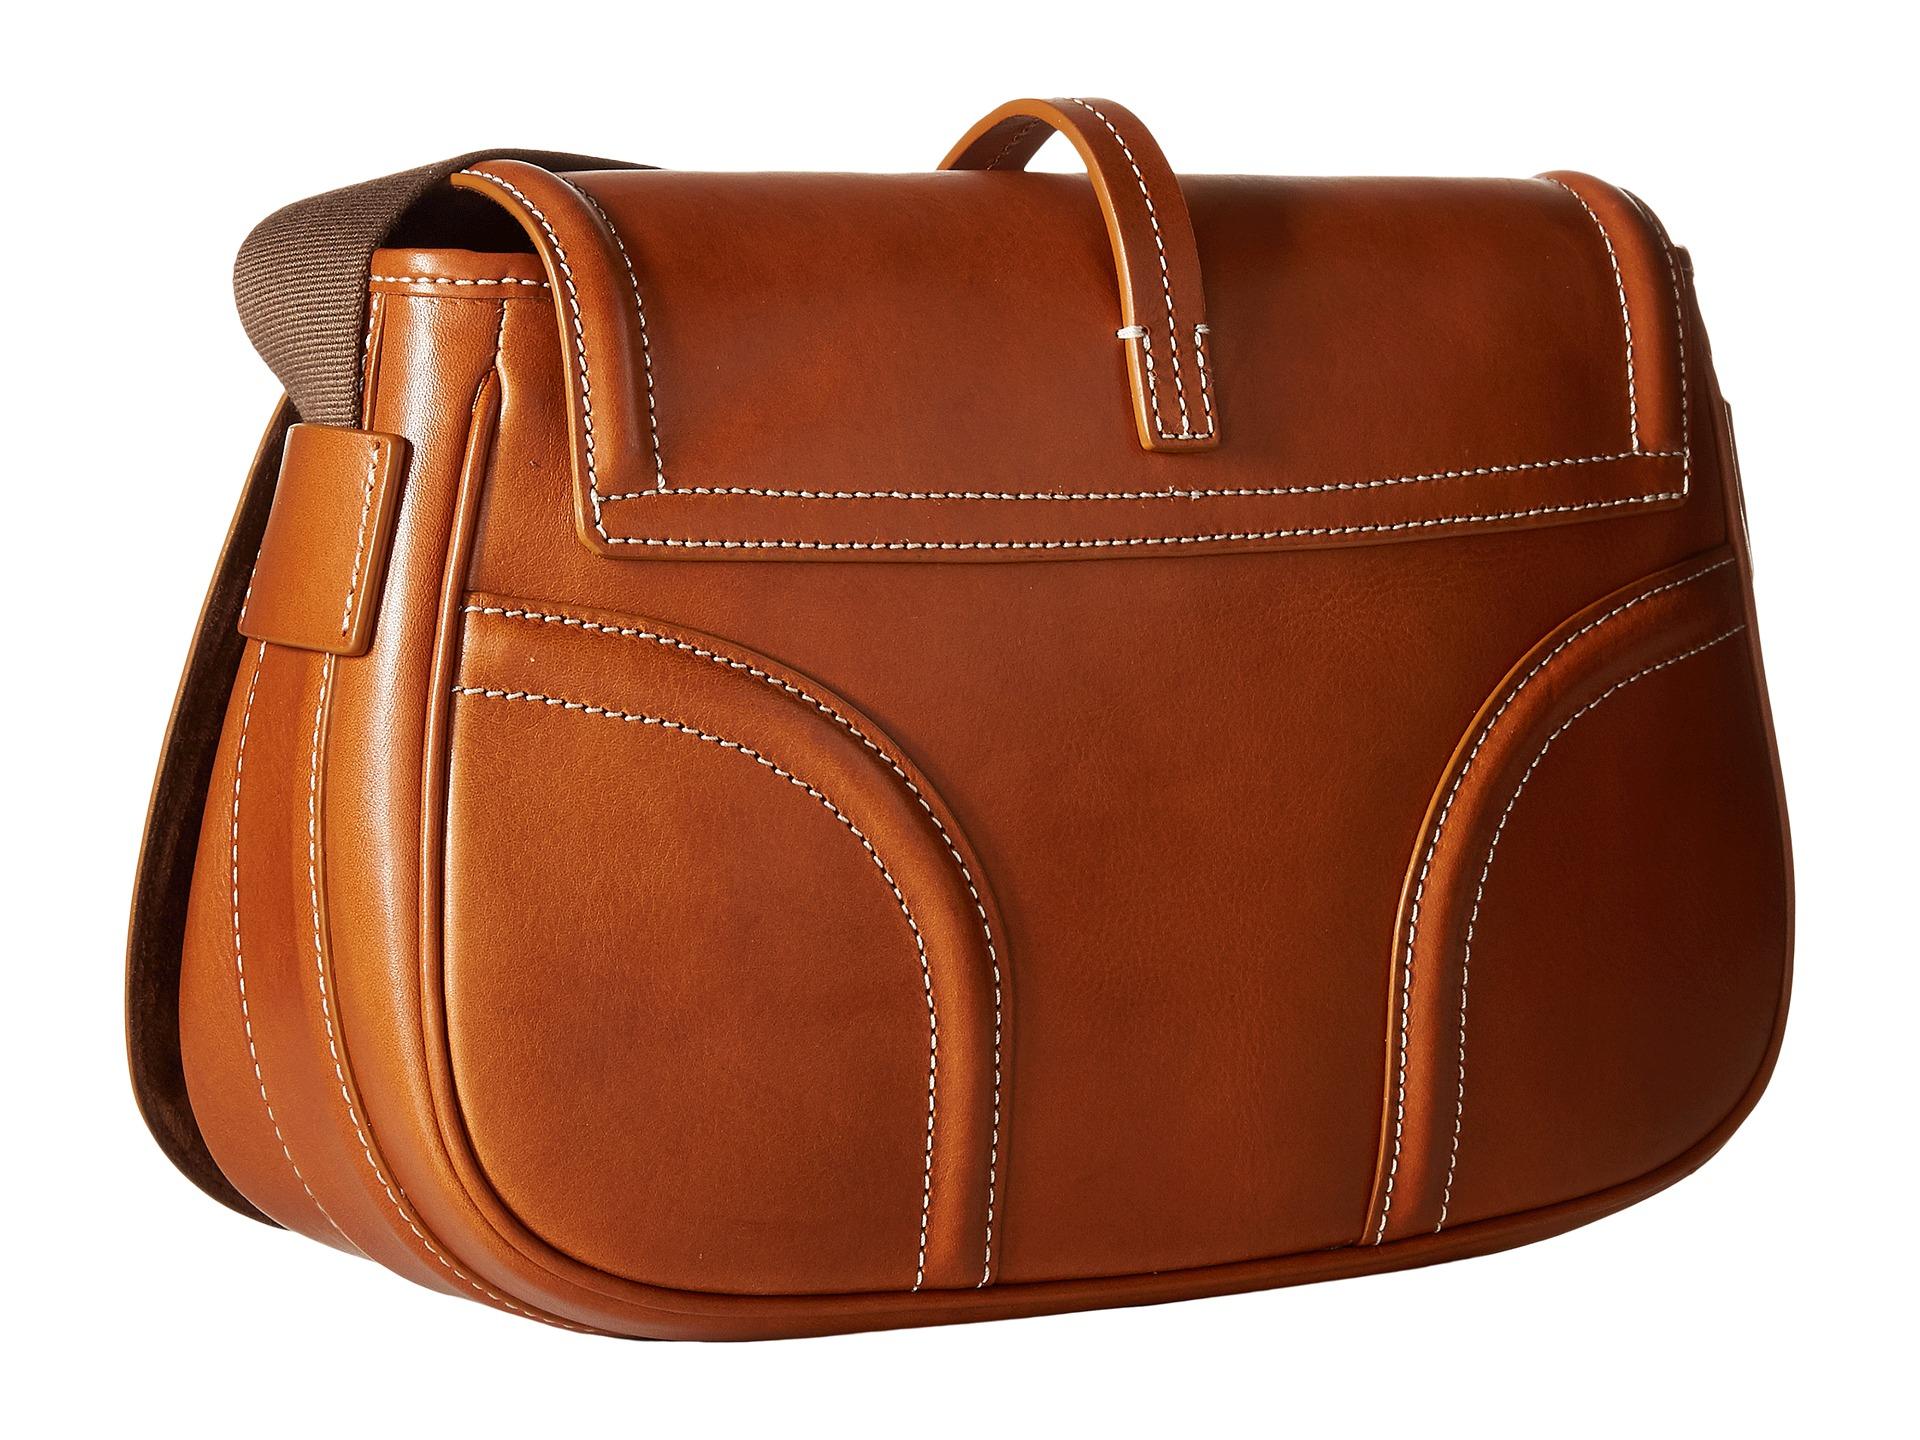 Dooney & Bourke Florentine Saddle Bag at Zappos.com